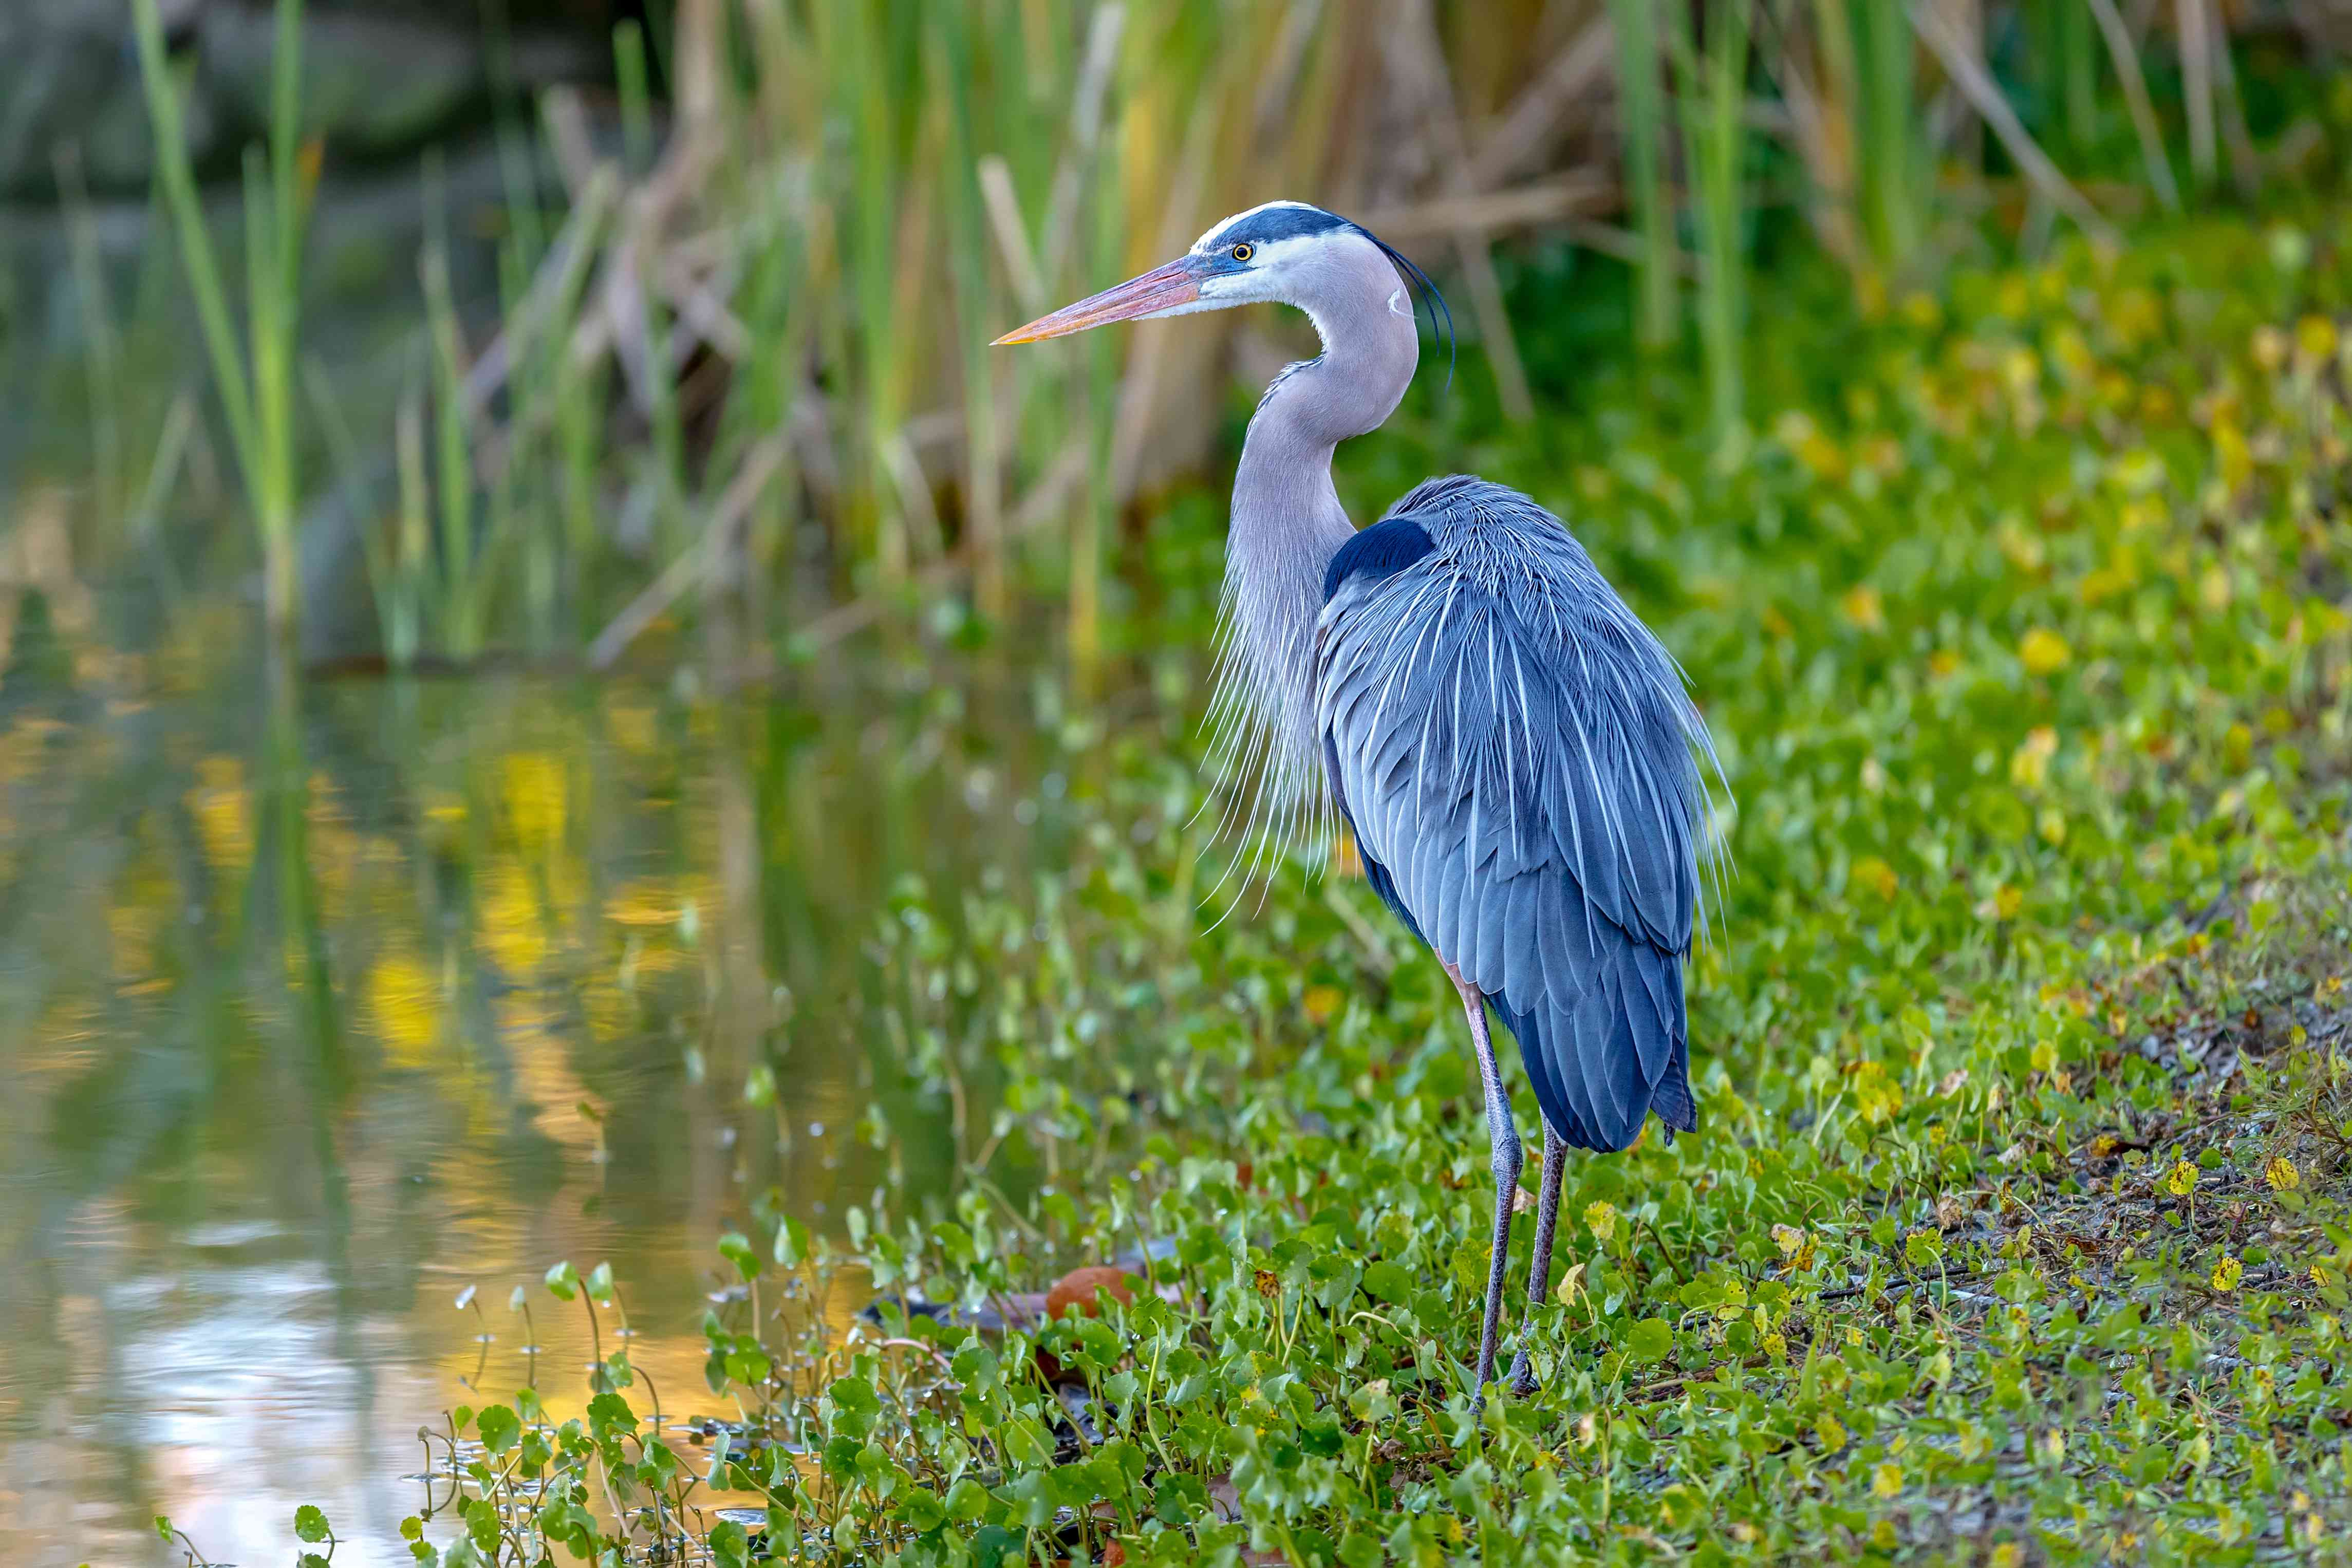 Blue Heron on the shore closeup